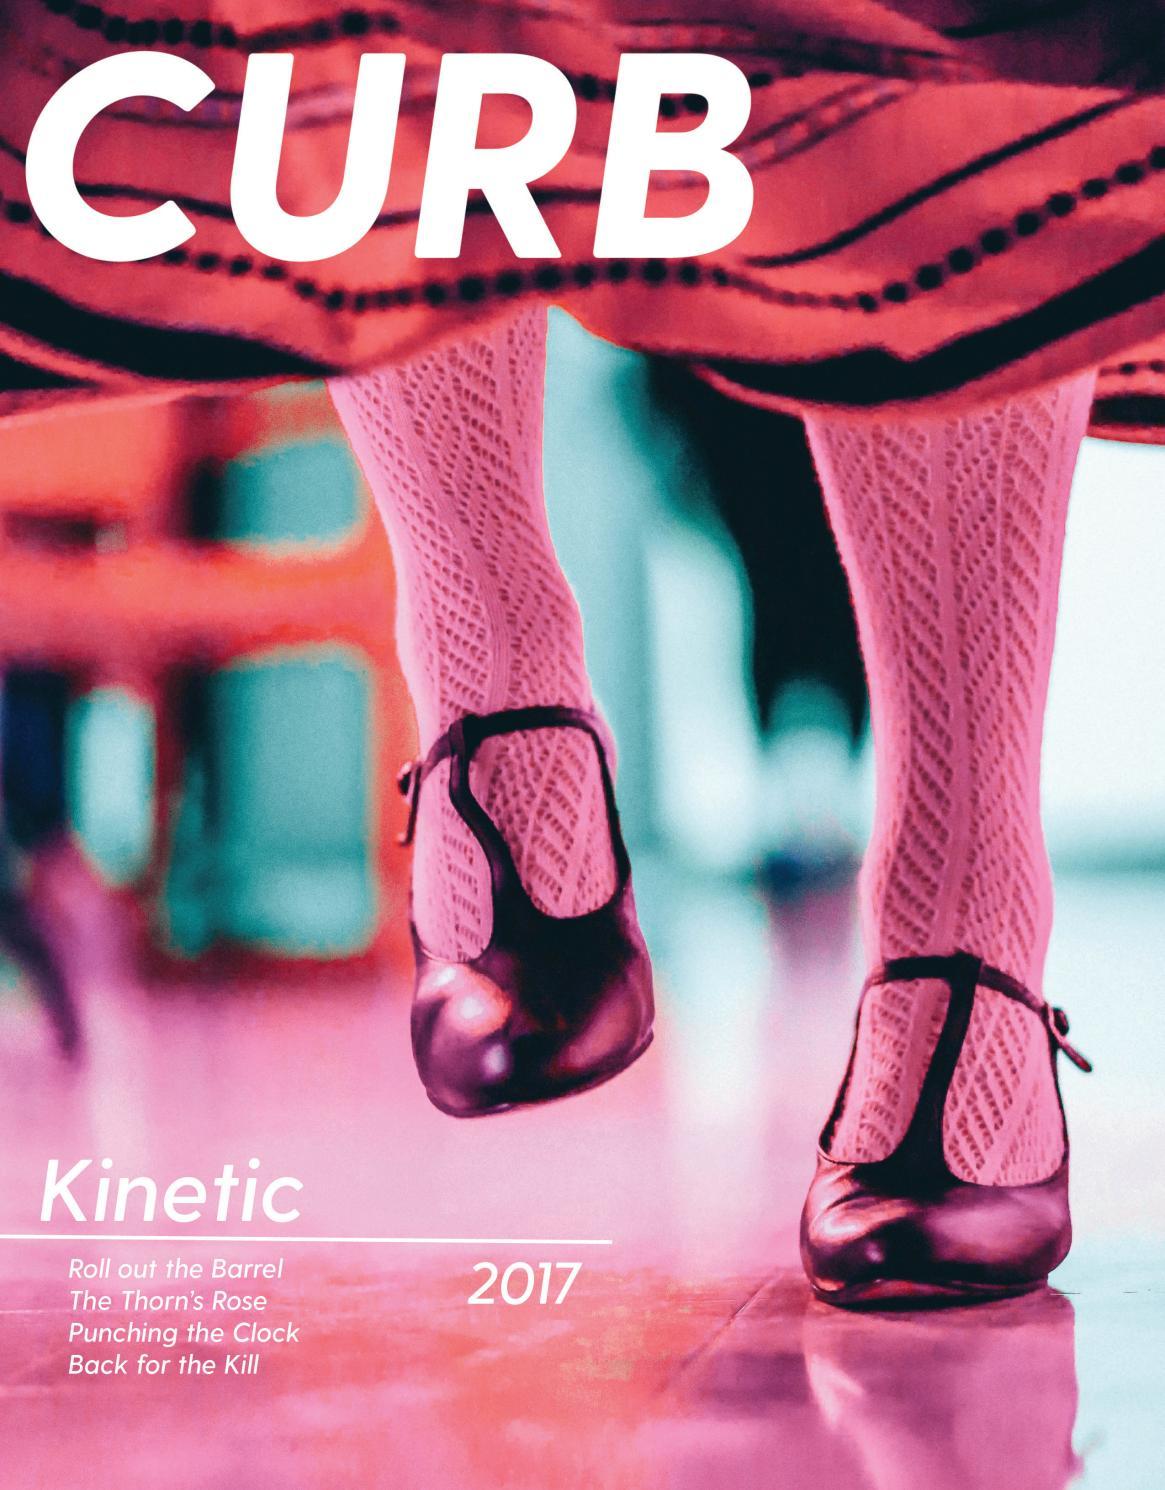 Curb 2017: Kinetic by Curb Magazine - issuu